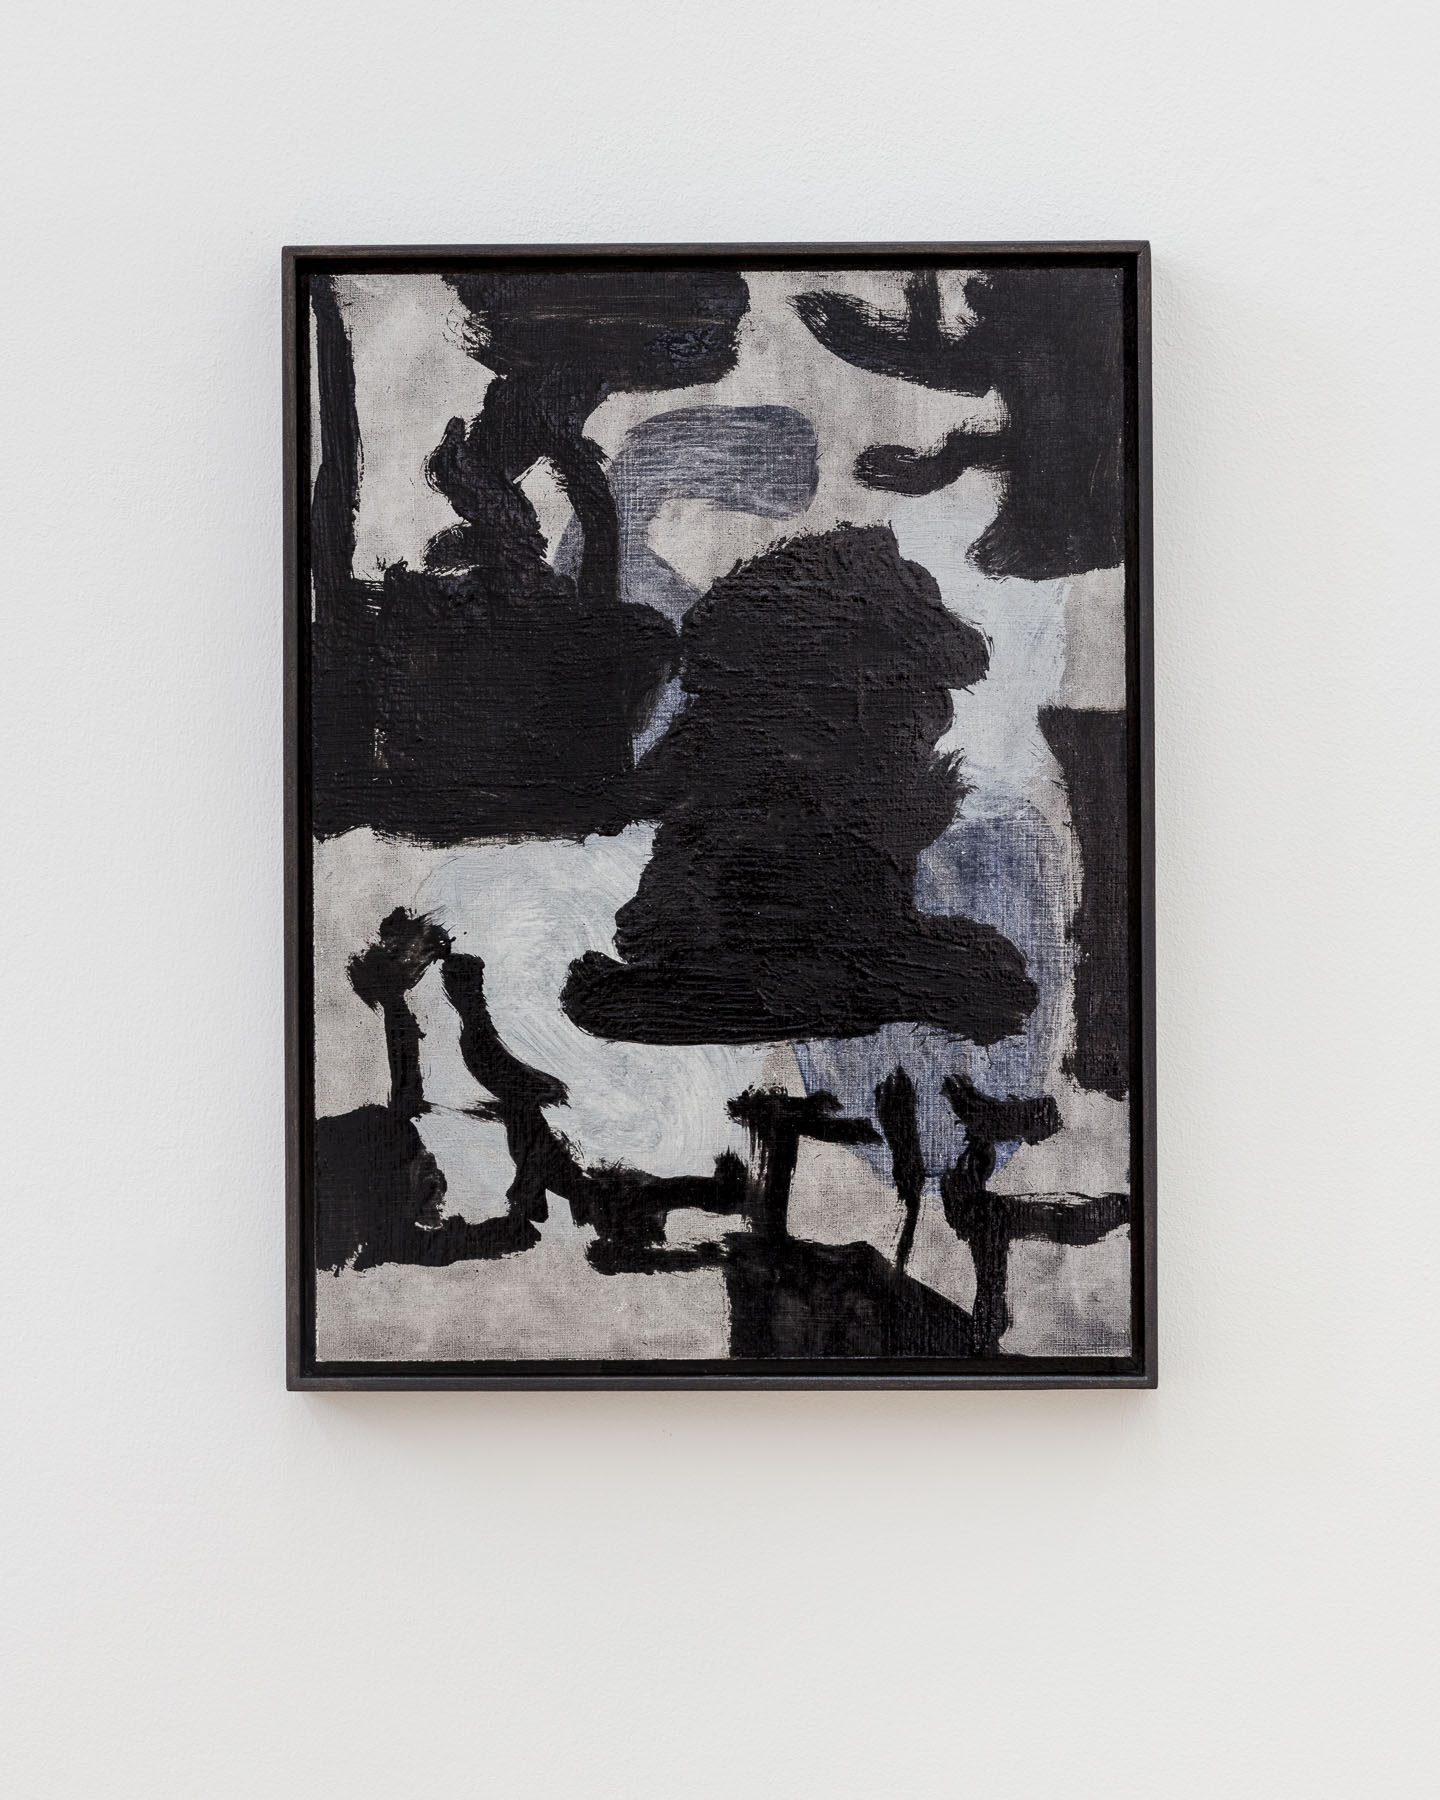 Veronika Hilger, untitled, 2016, oil on paper, 40 x 30 cm